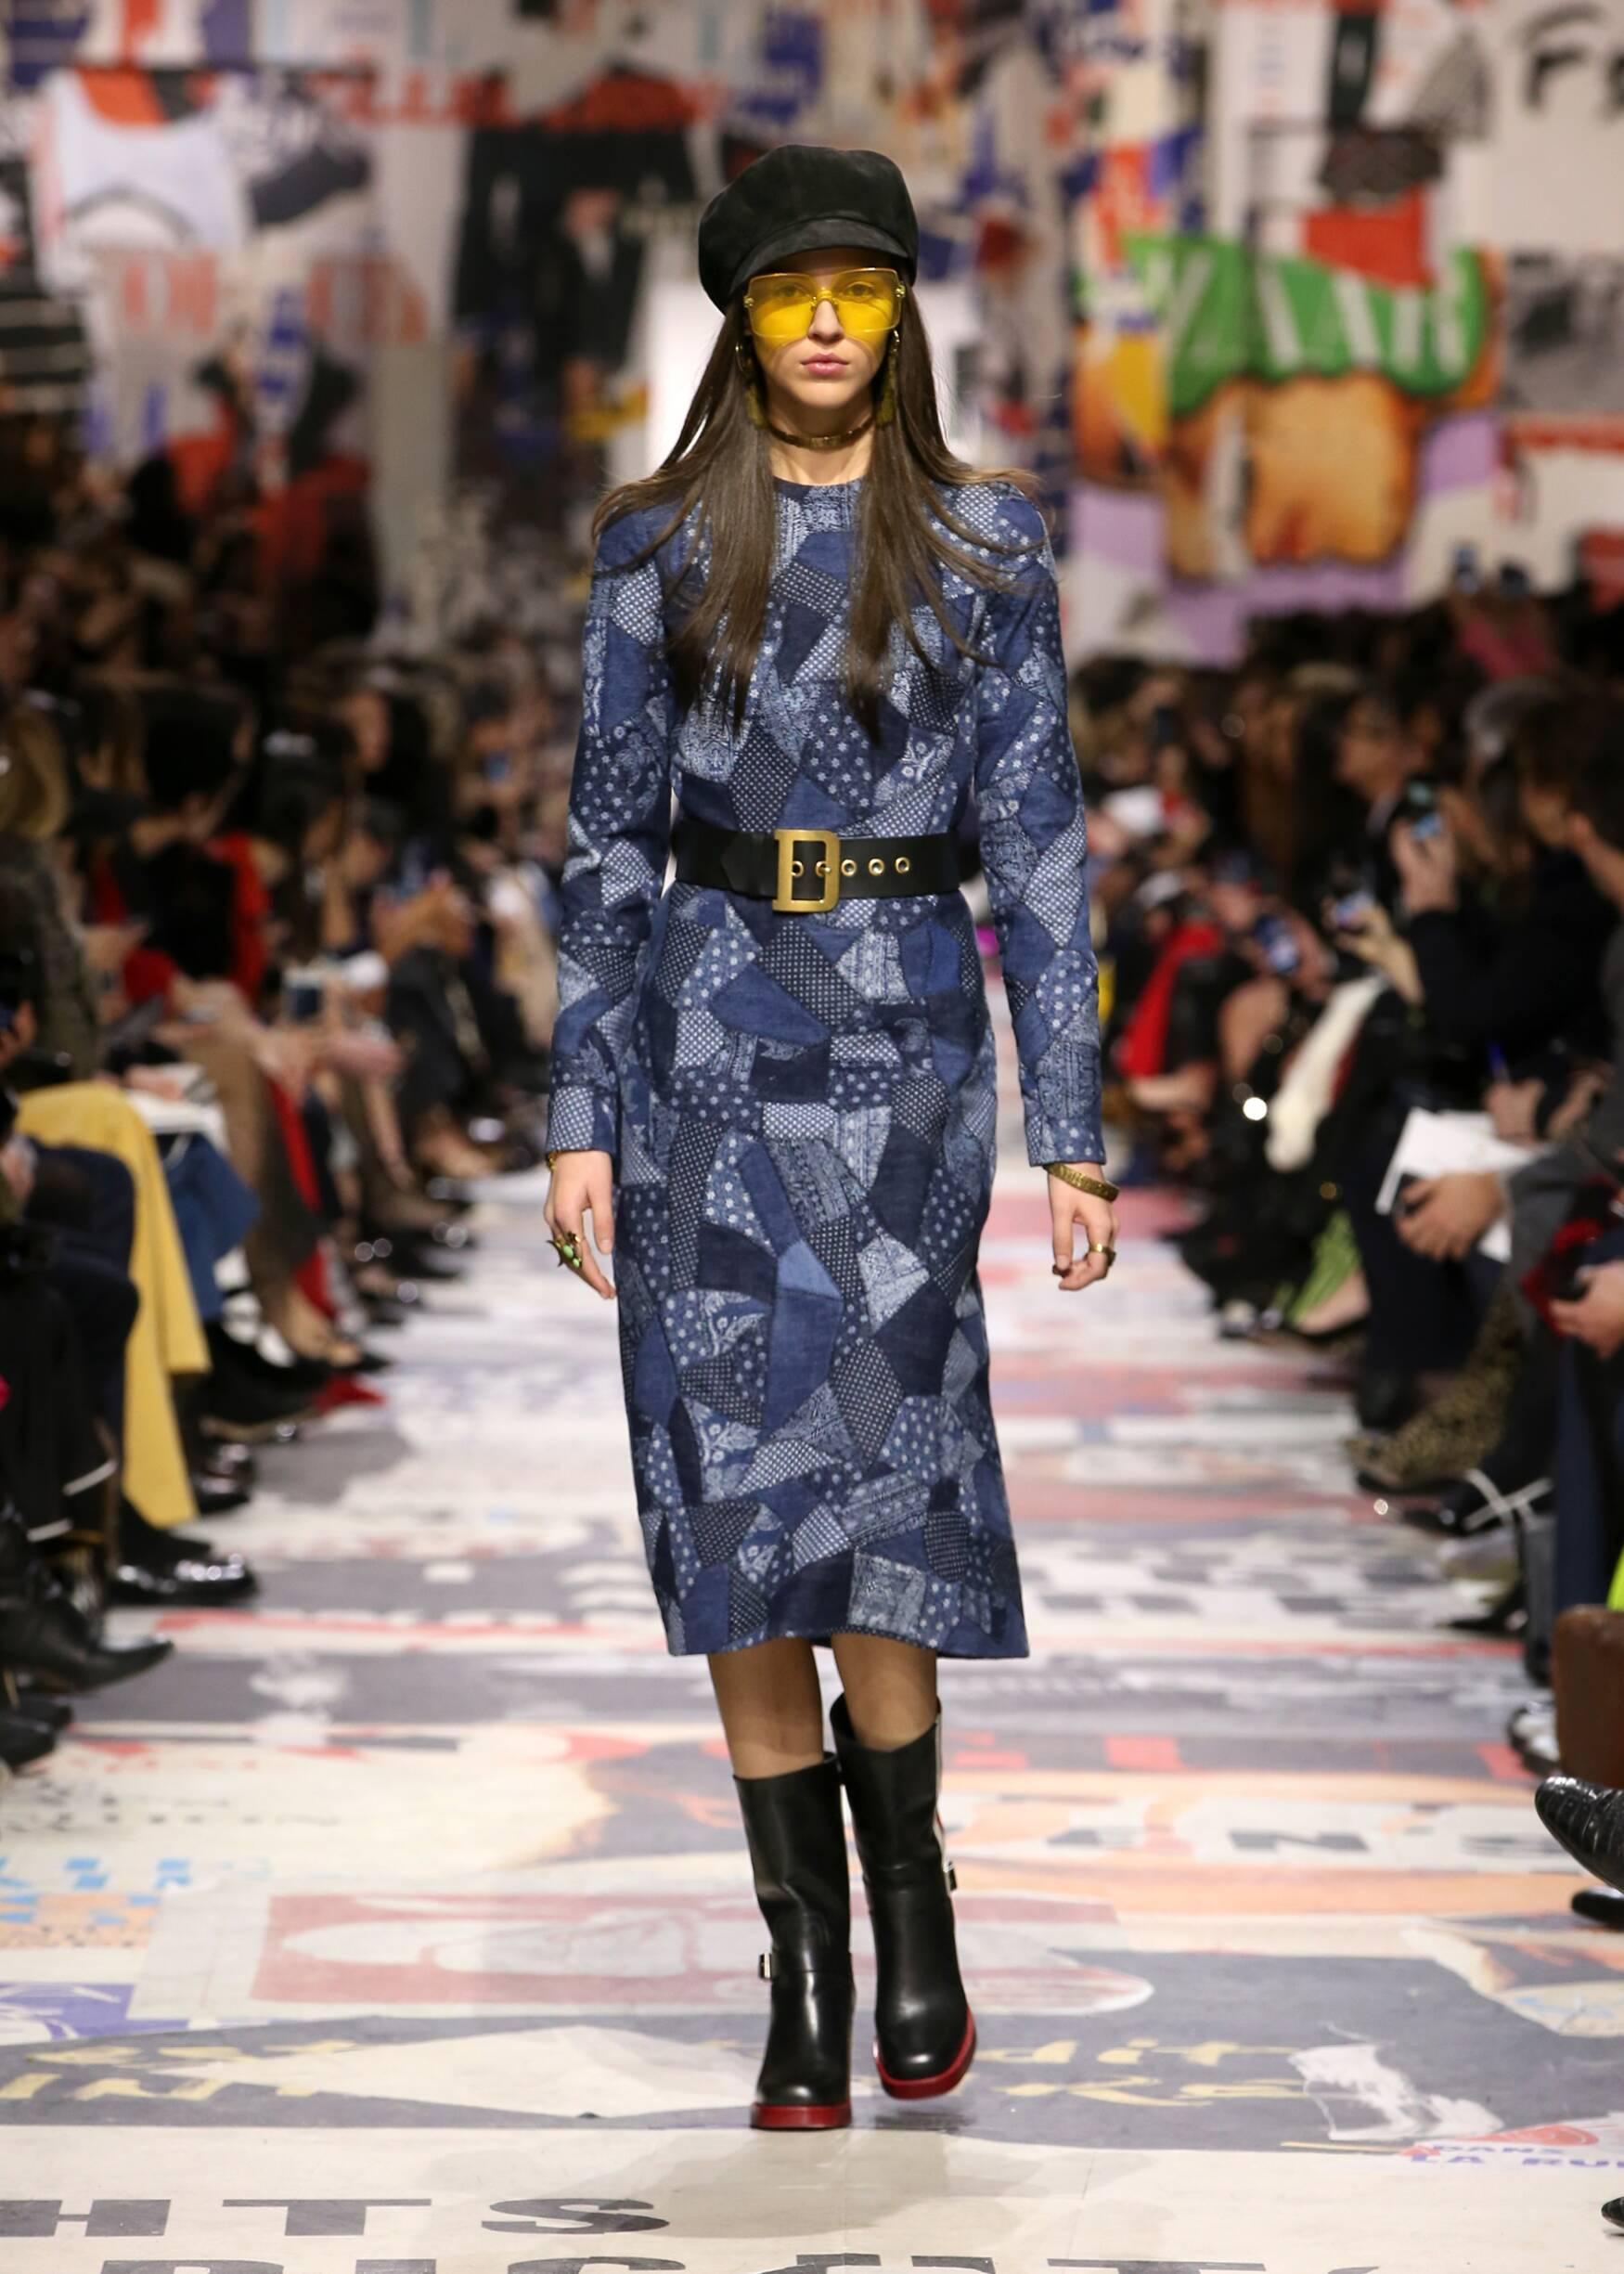 2018 Dior Woman Winter Runway